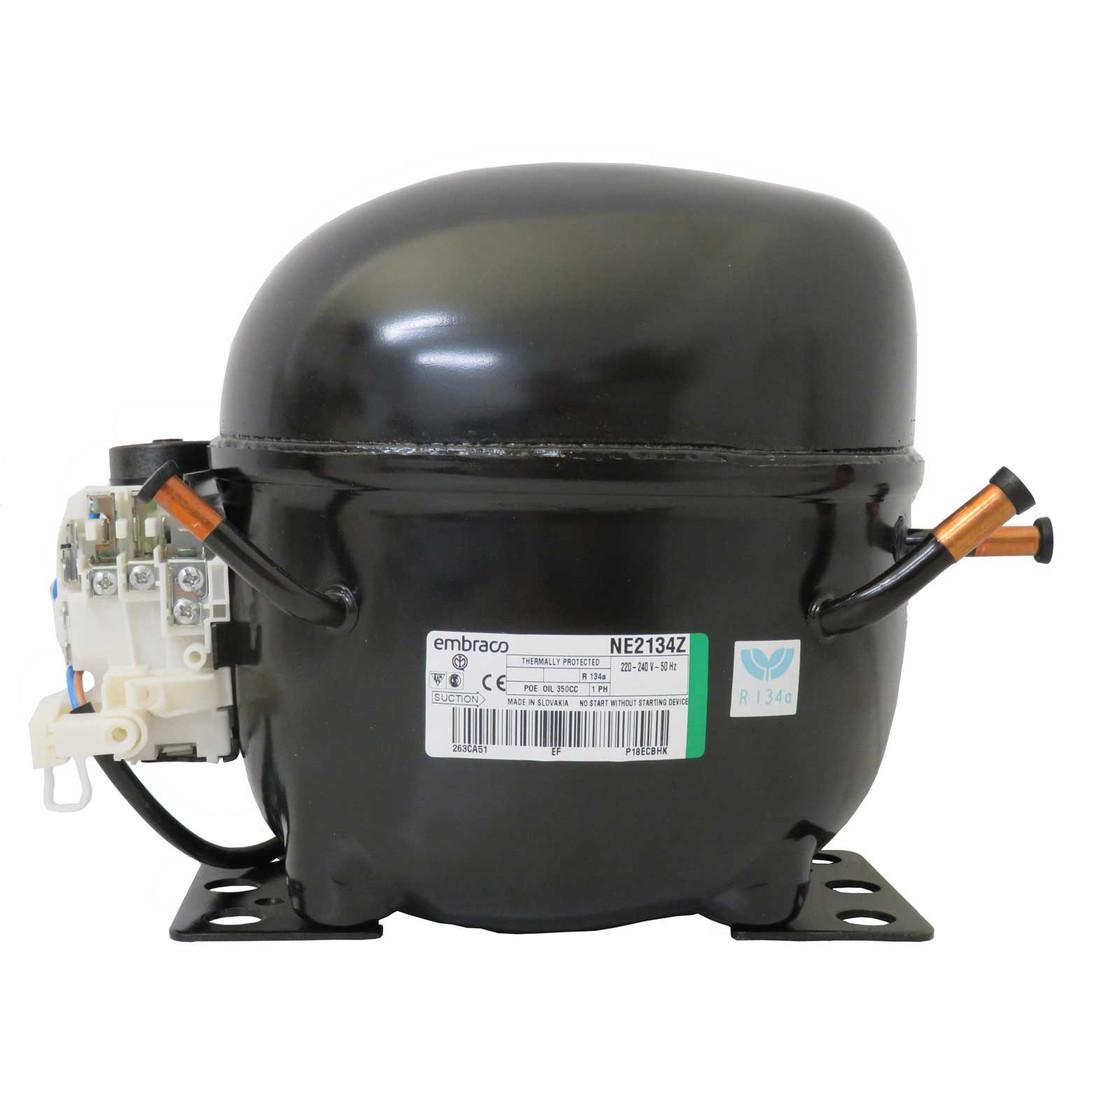 Компрессор холодильный Embraco NE2134Z  359 W (LBP) R134a (263CA51)